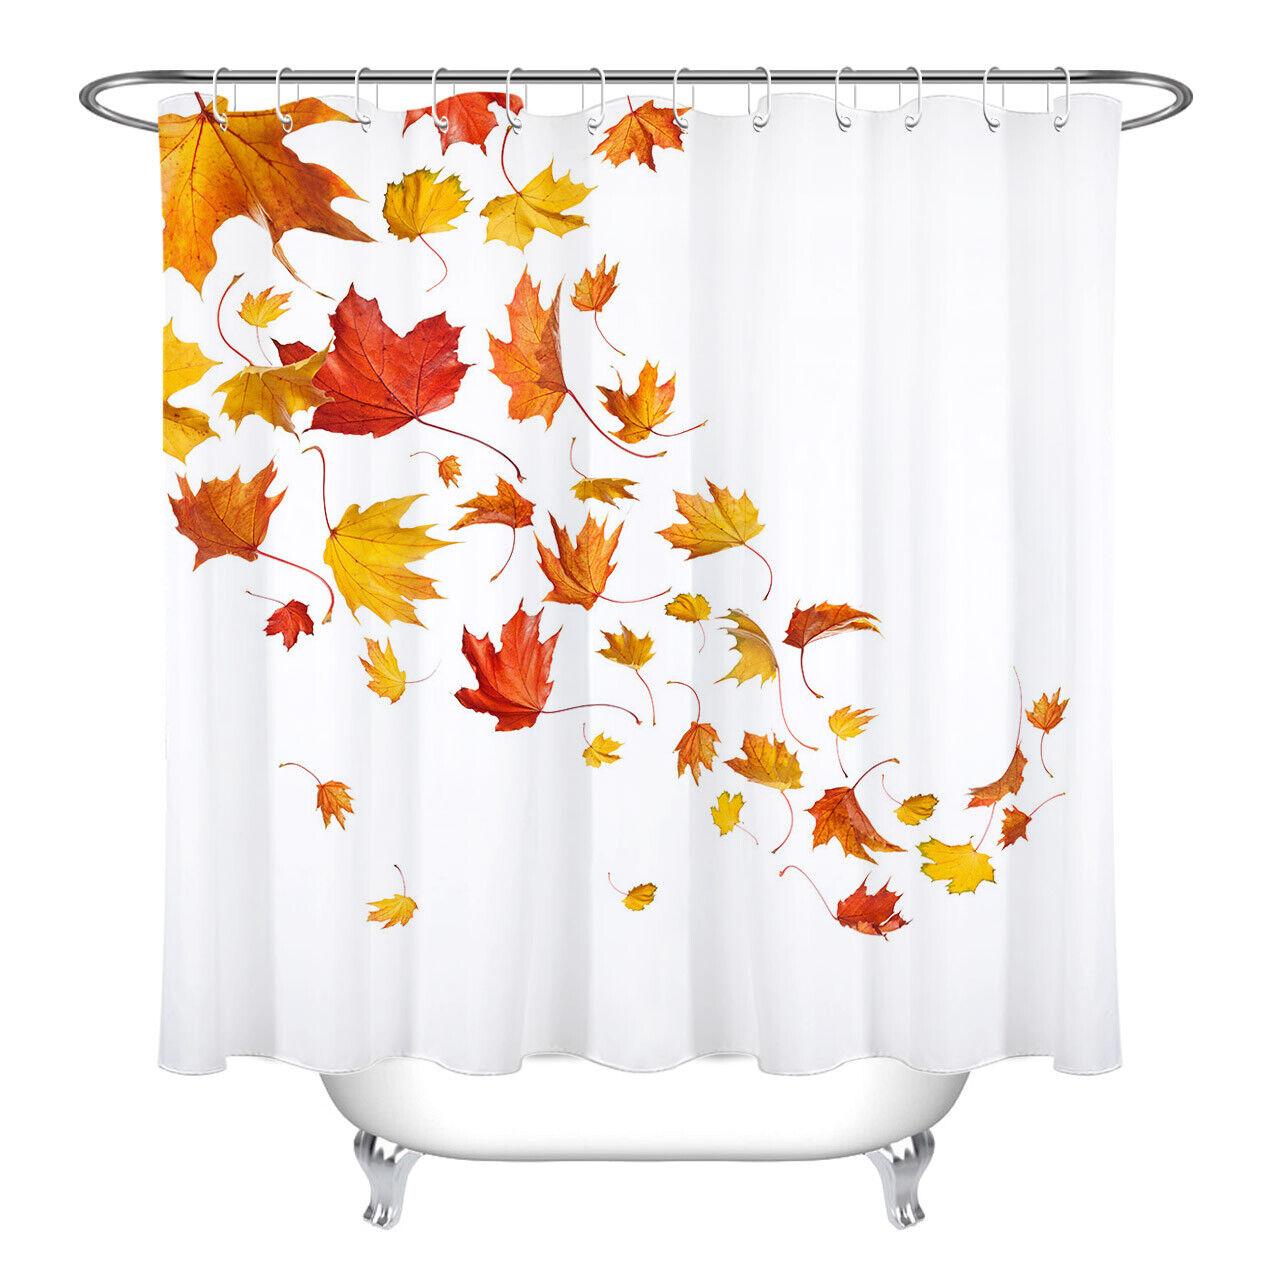 Beautiful Autumn Maple Leaves Design Fabric Shower Curtain Set Bath Decor 72x72